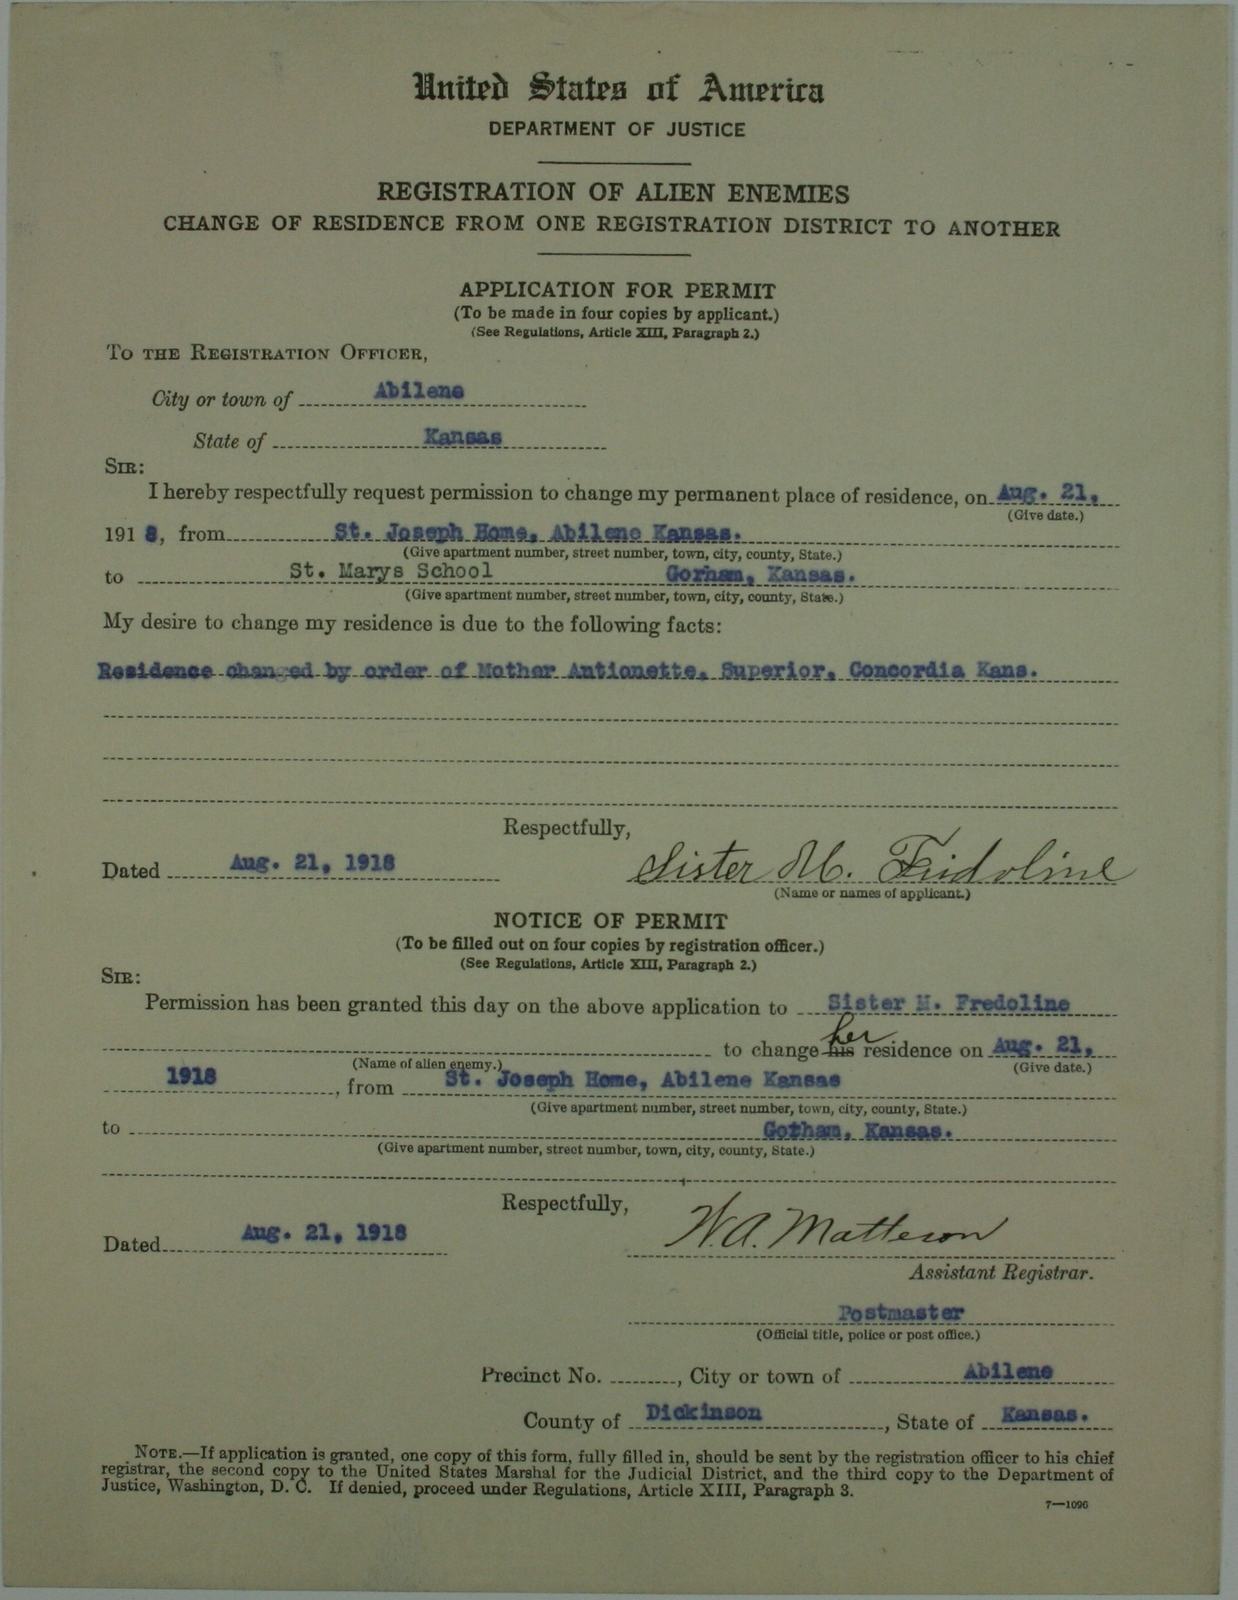 Alien Application Permit for Sister M  Fredoline - U S  National